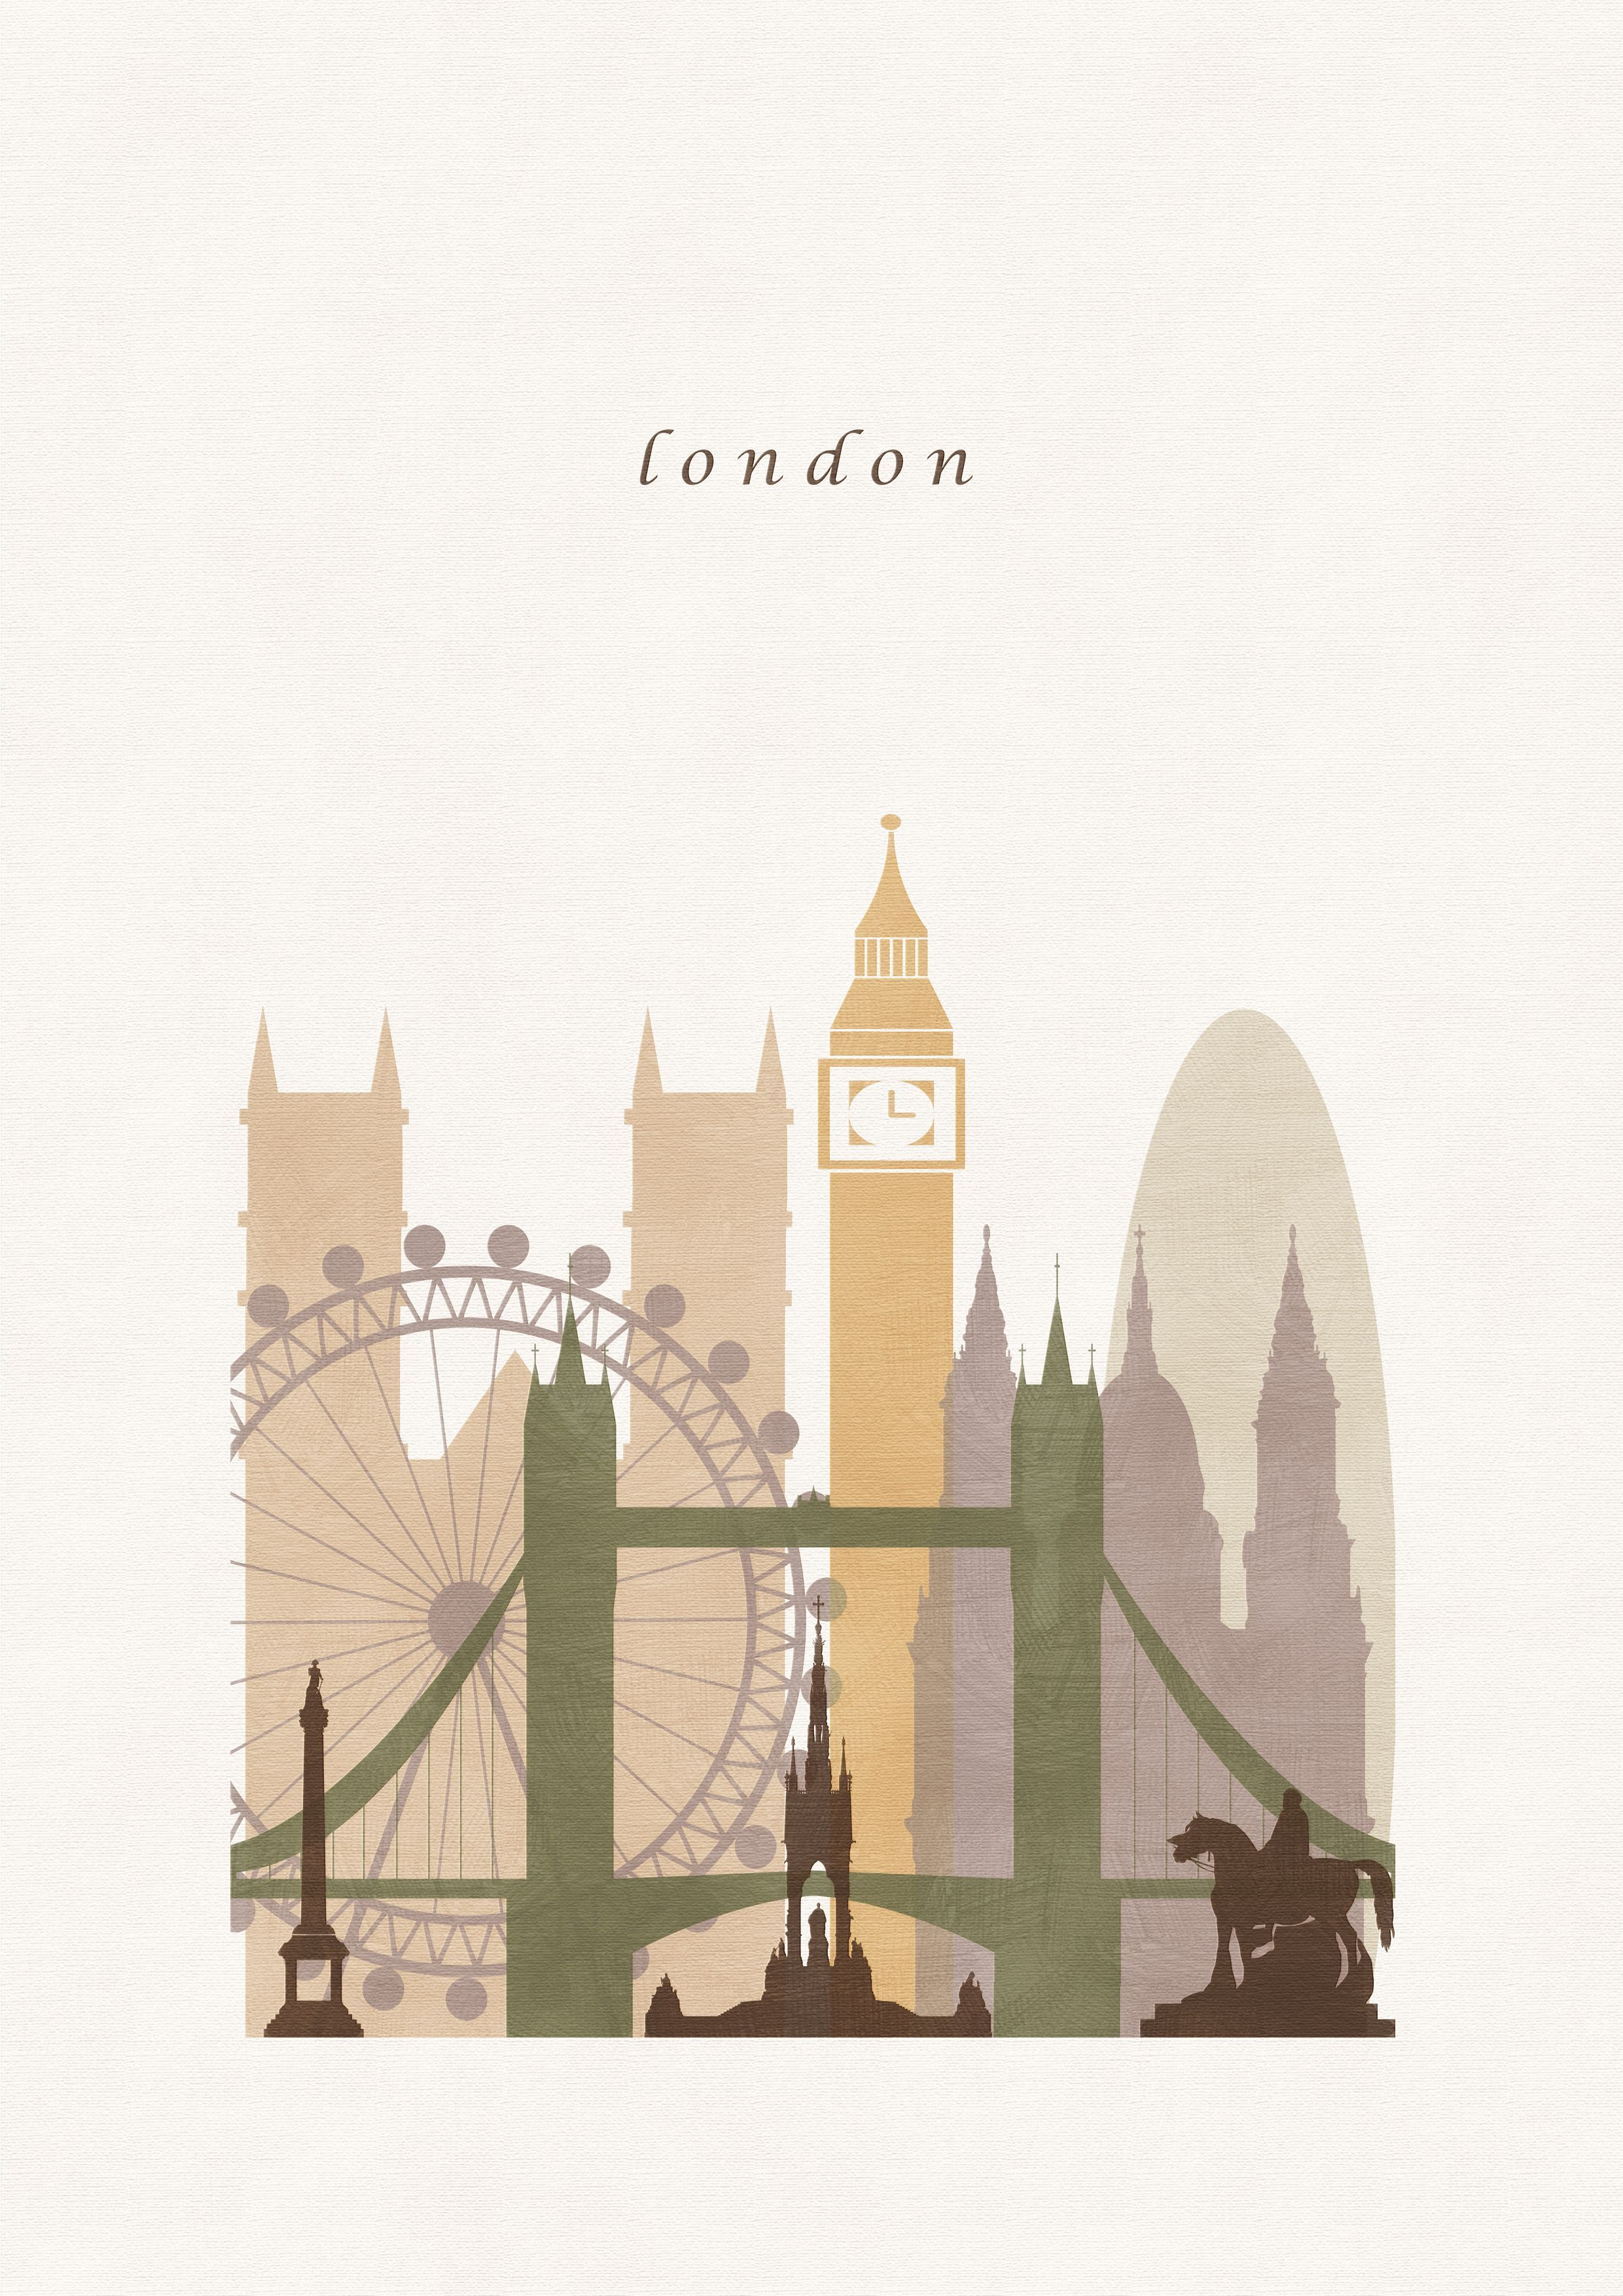 London Downloadable Prints Bedroom England Minimalist Art Etsy Minimalist Art Print Travel Wall Art Prints